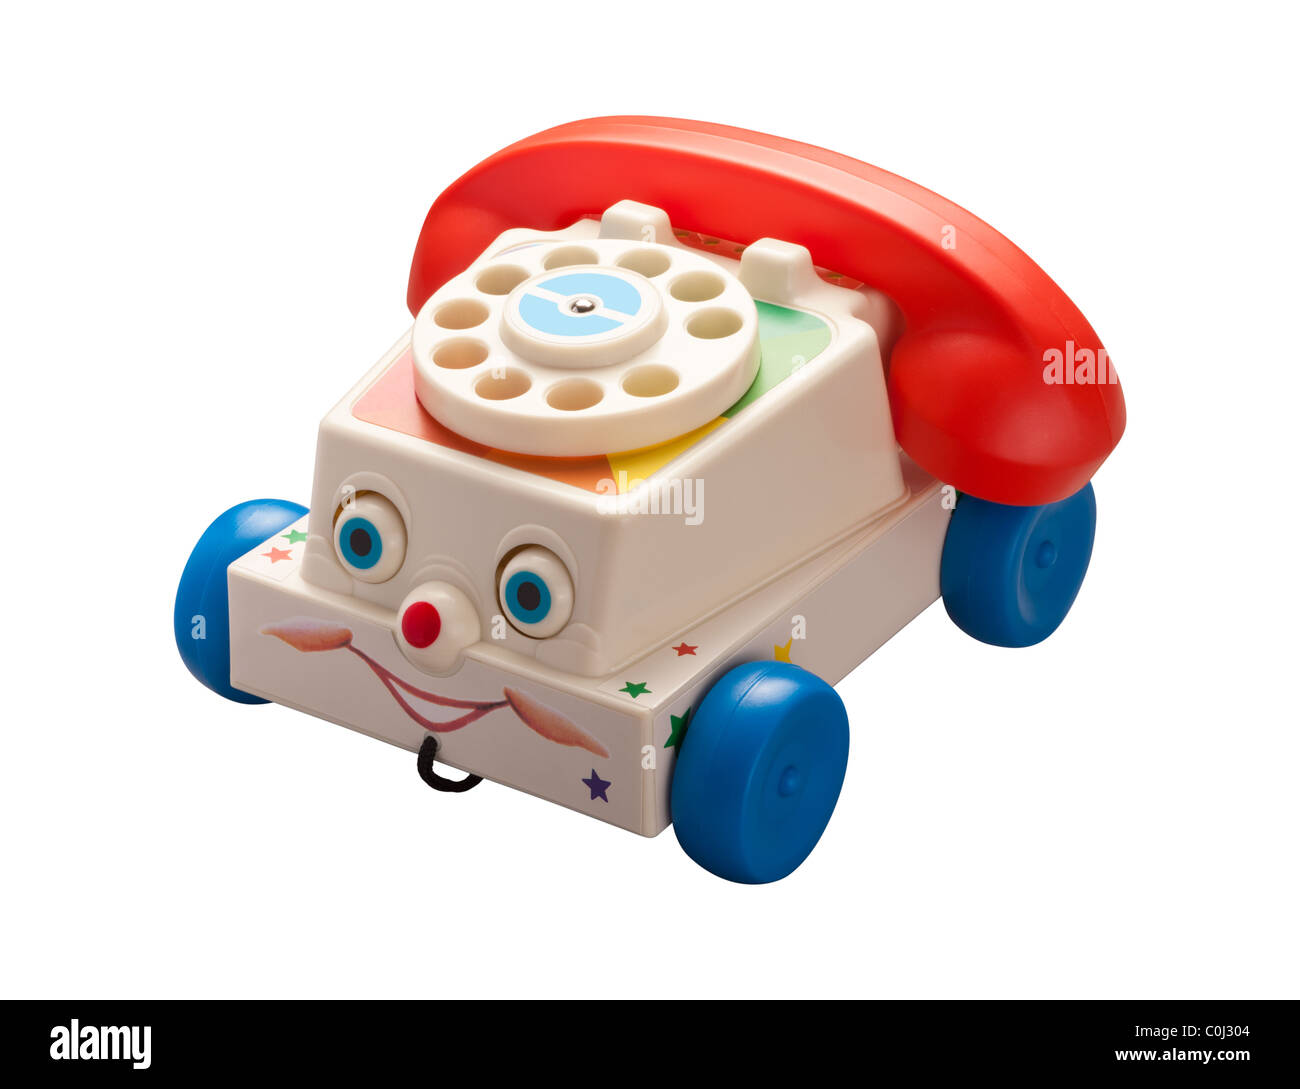 Teléfono de Juguete antiguo aislado sobre un fondo blanco. Imagen De Stock